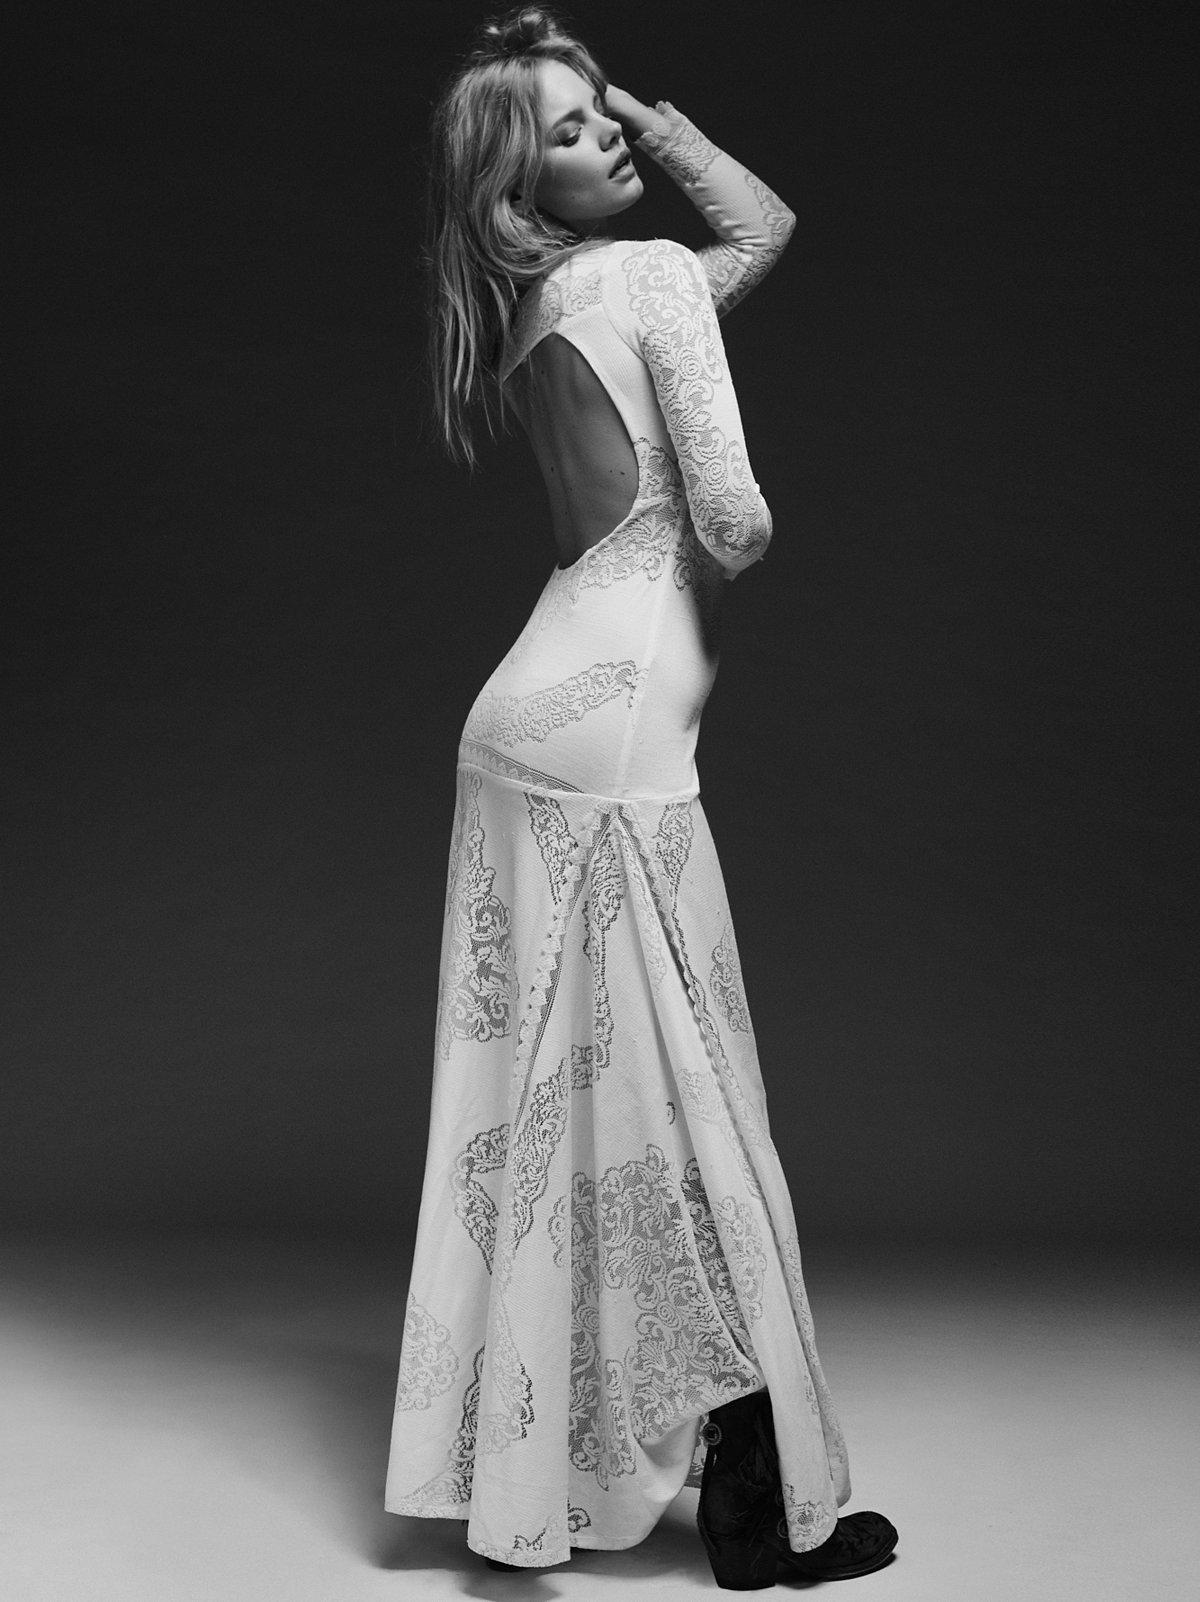 Carolyn's 限量版白色连衣裙